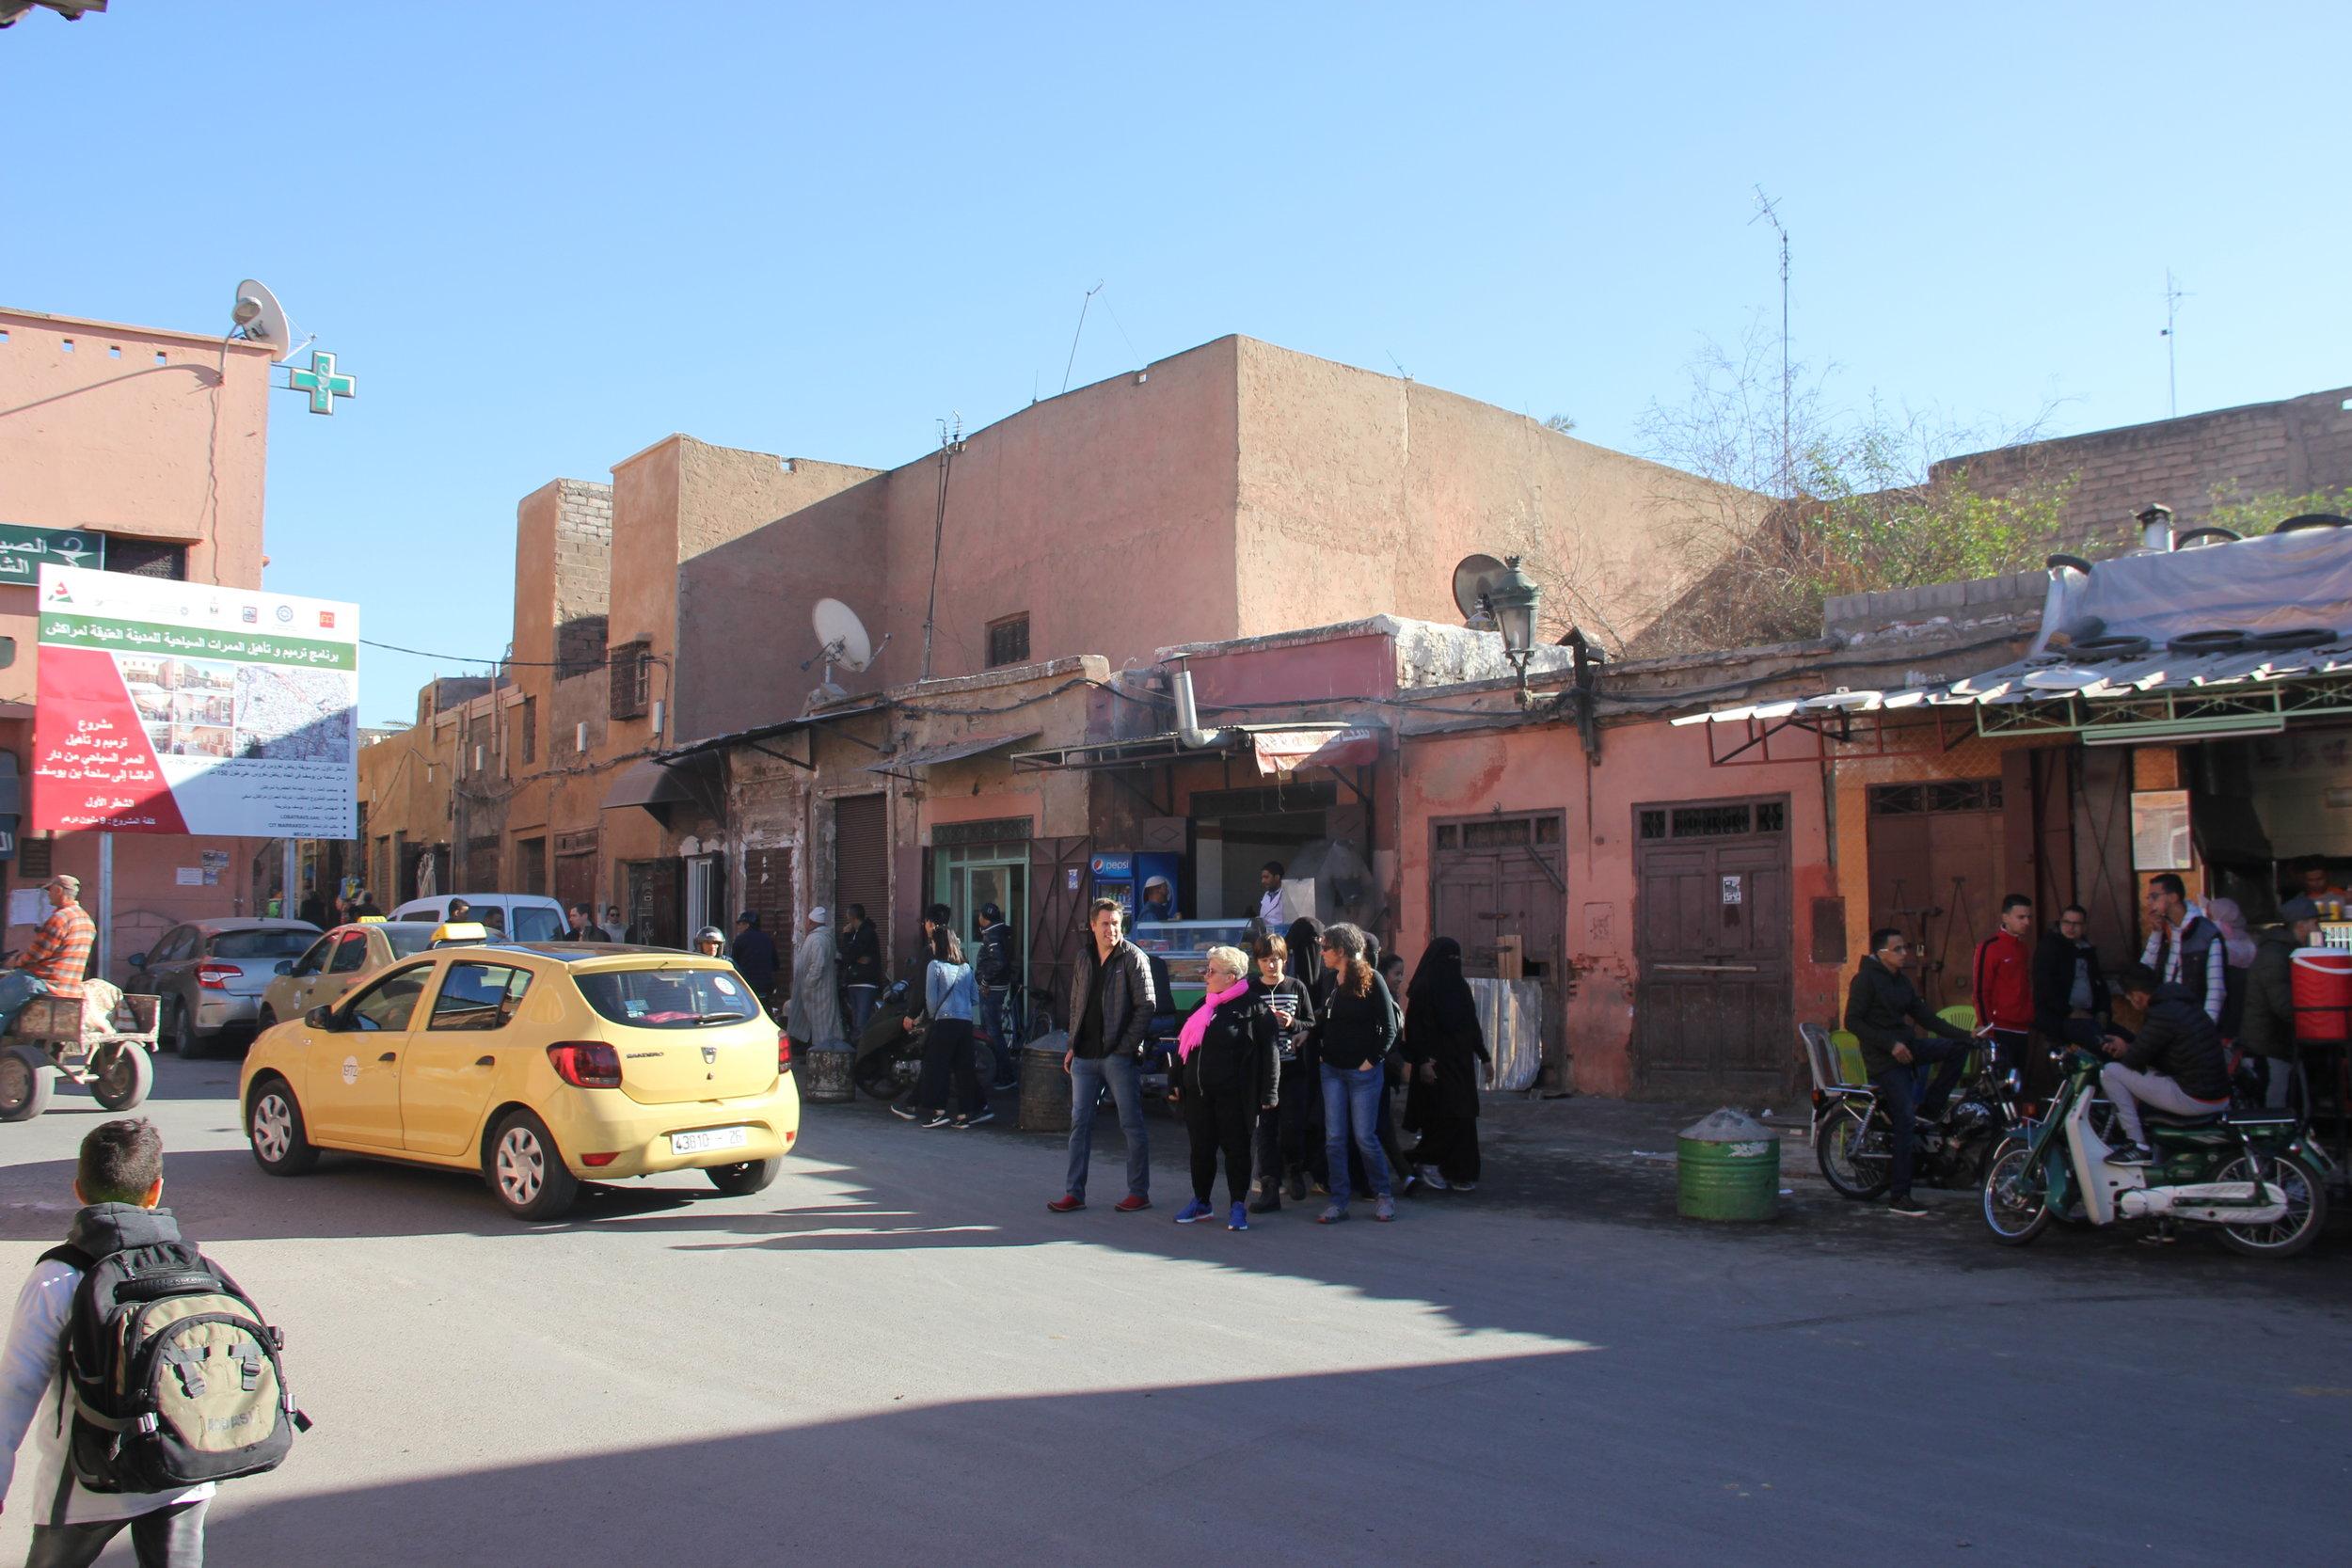 18.31.12_Morocco_Devaraj_Thea_Suriya_Loka.JPG